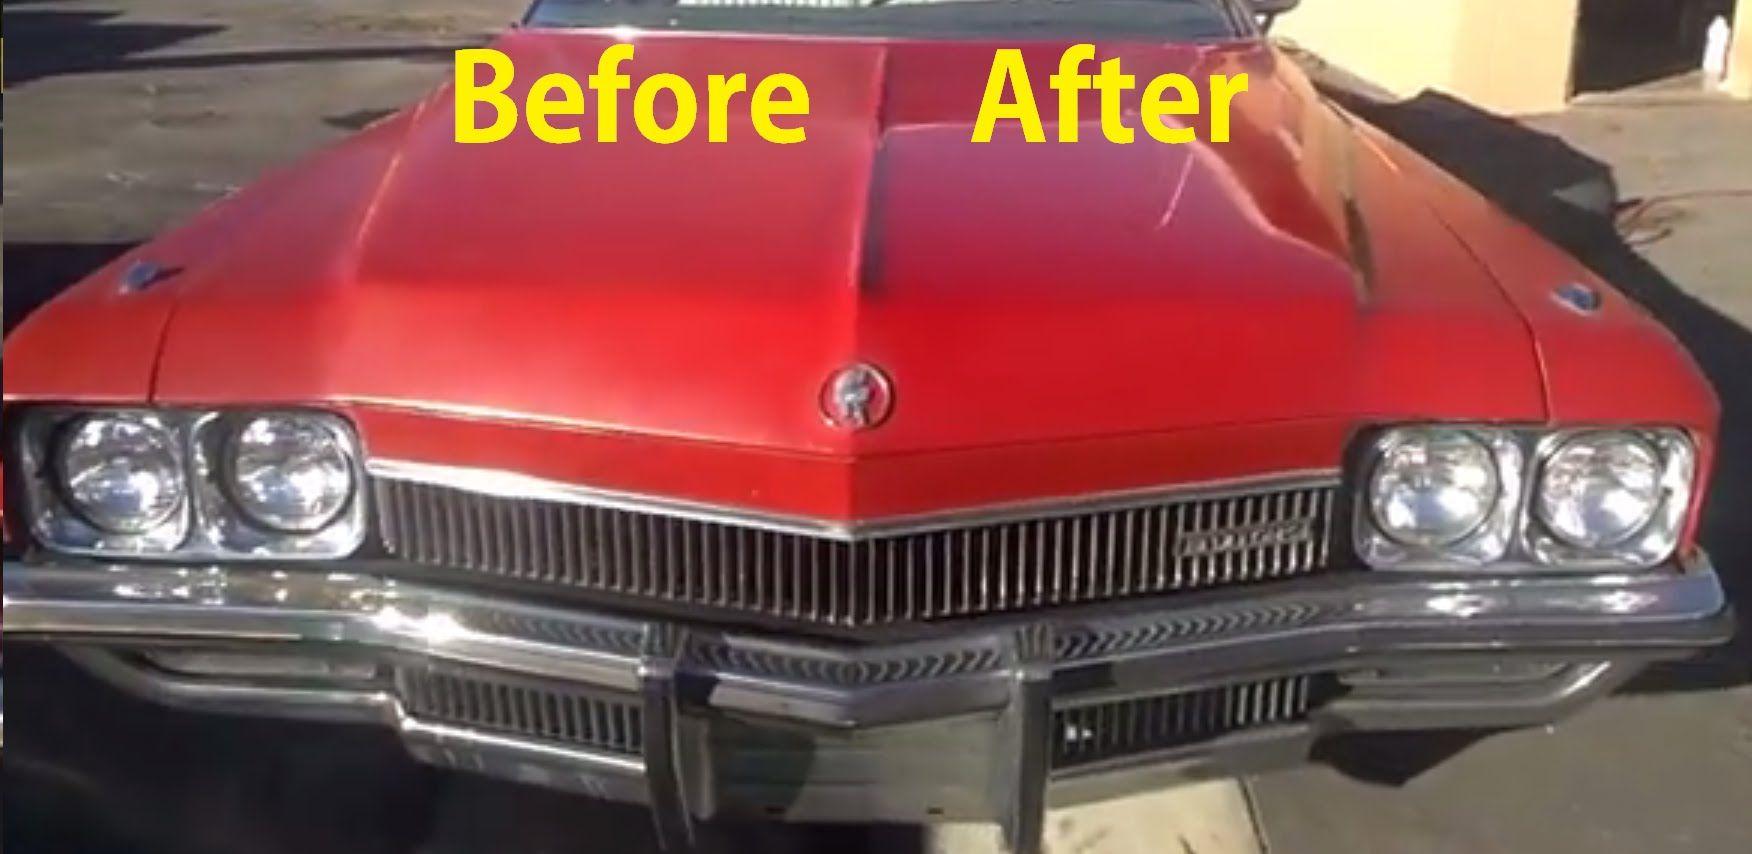 Car Polishing DIY Buffing Auto Restoration Restore Paint